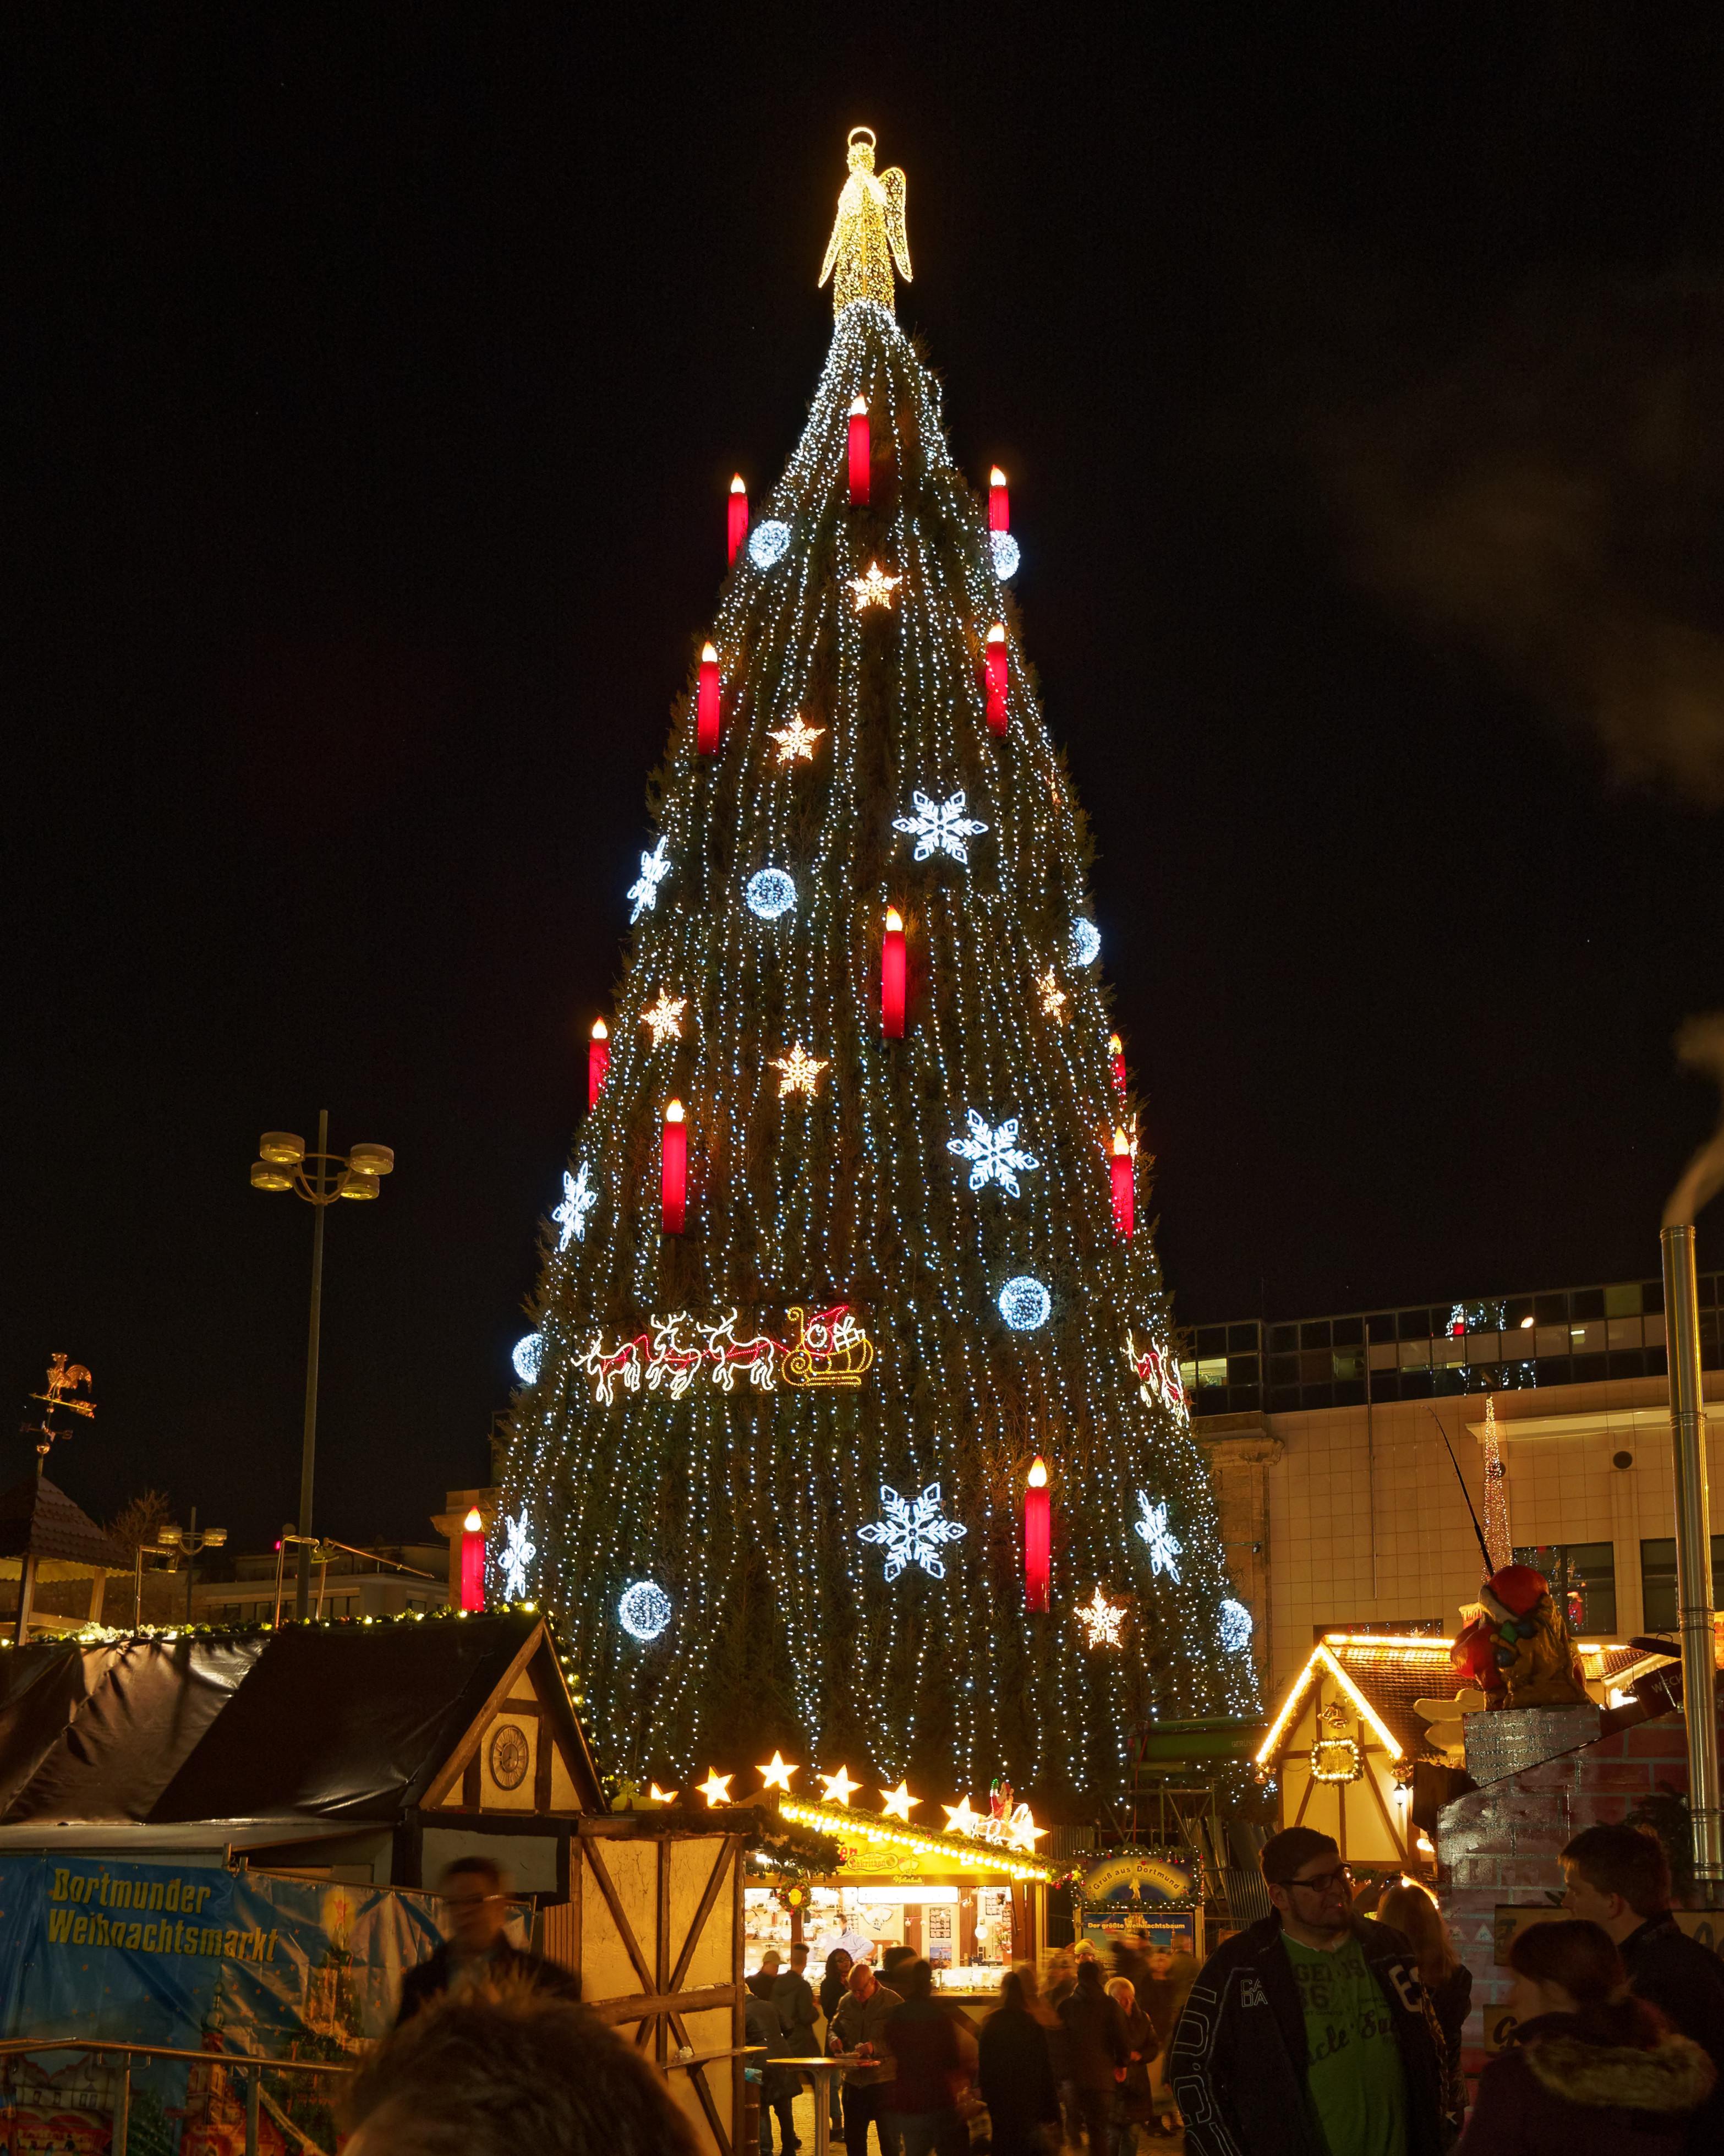 dortmund christmas market wikipedia  dortmunder weihnachtsmarkt.php #1